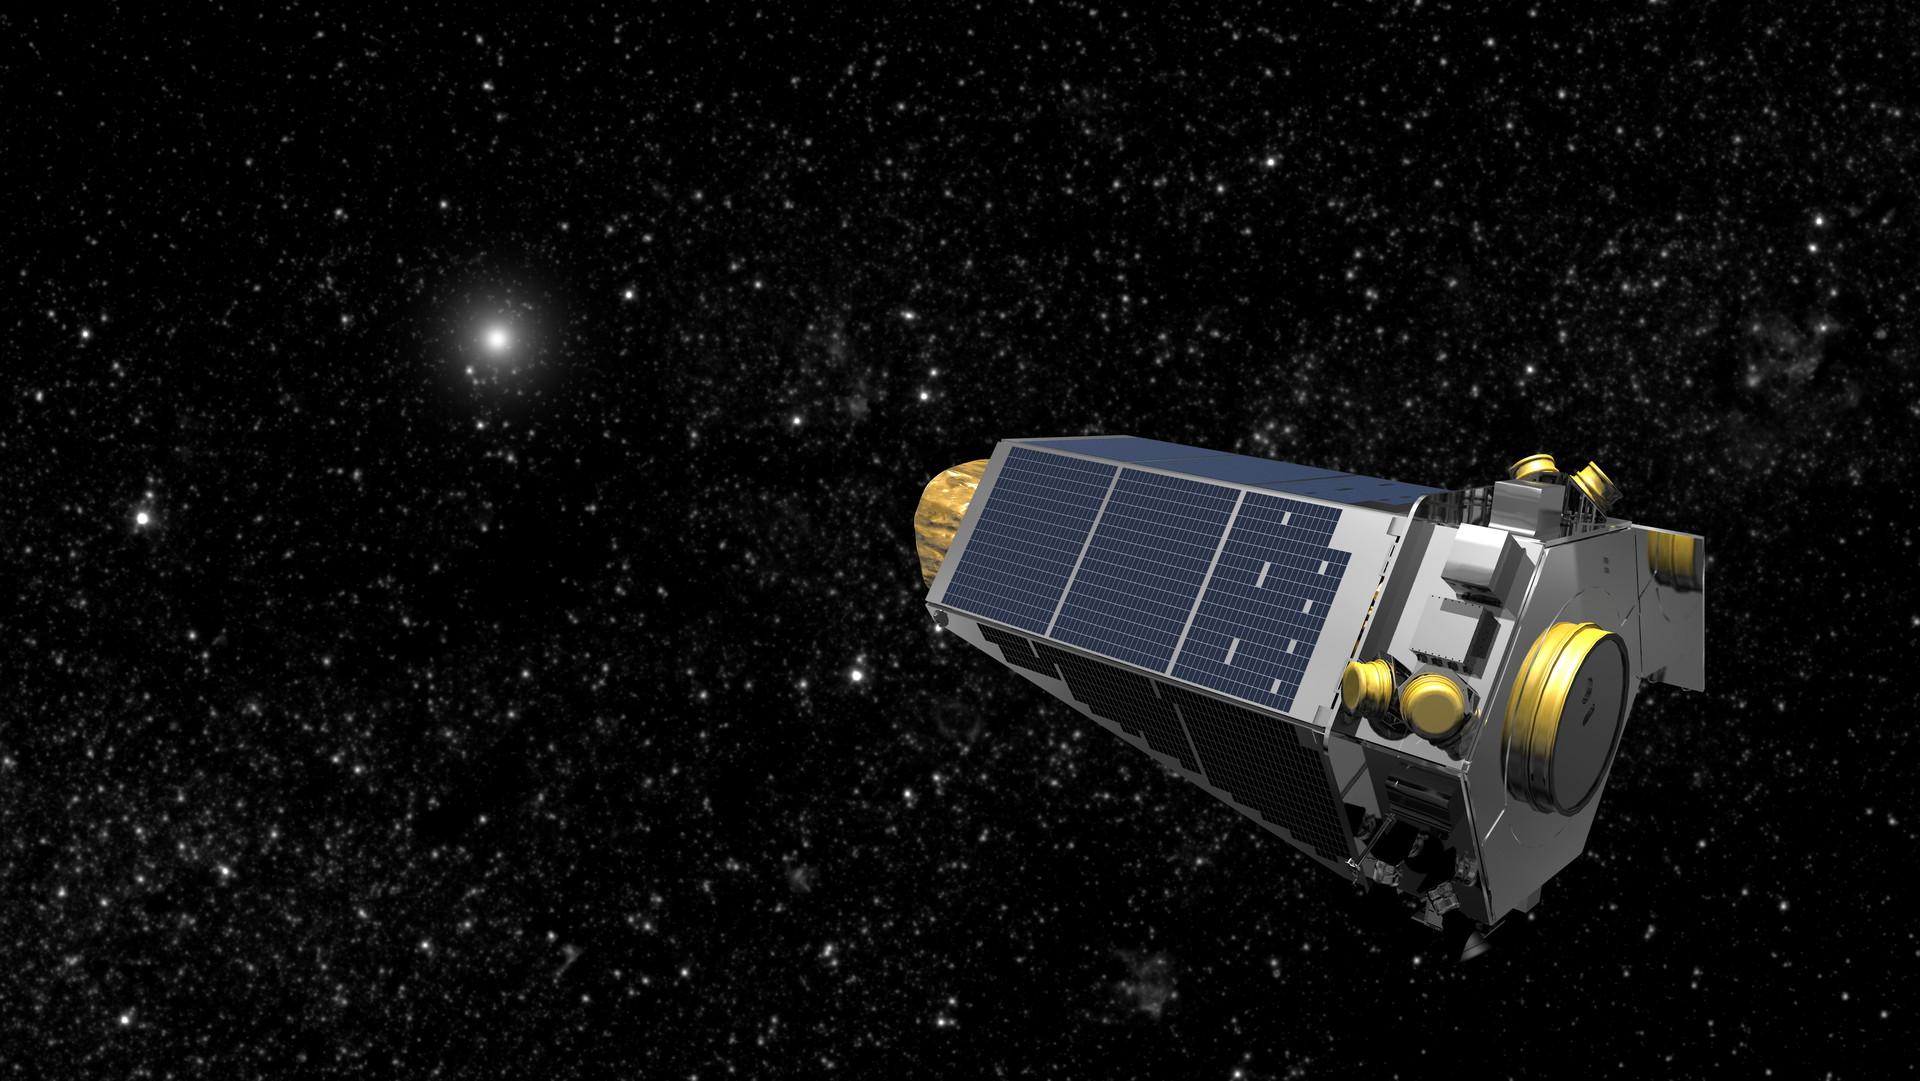 Kepler space telescope, केपलर स्पेस टेलिस्कोप